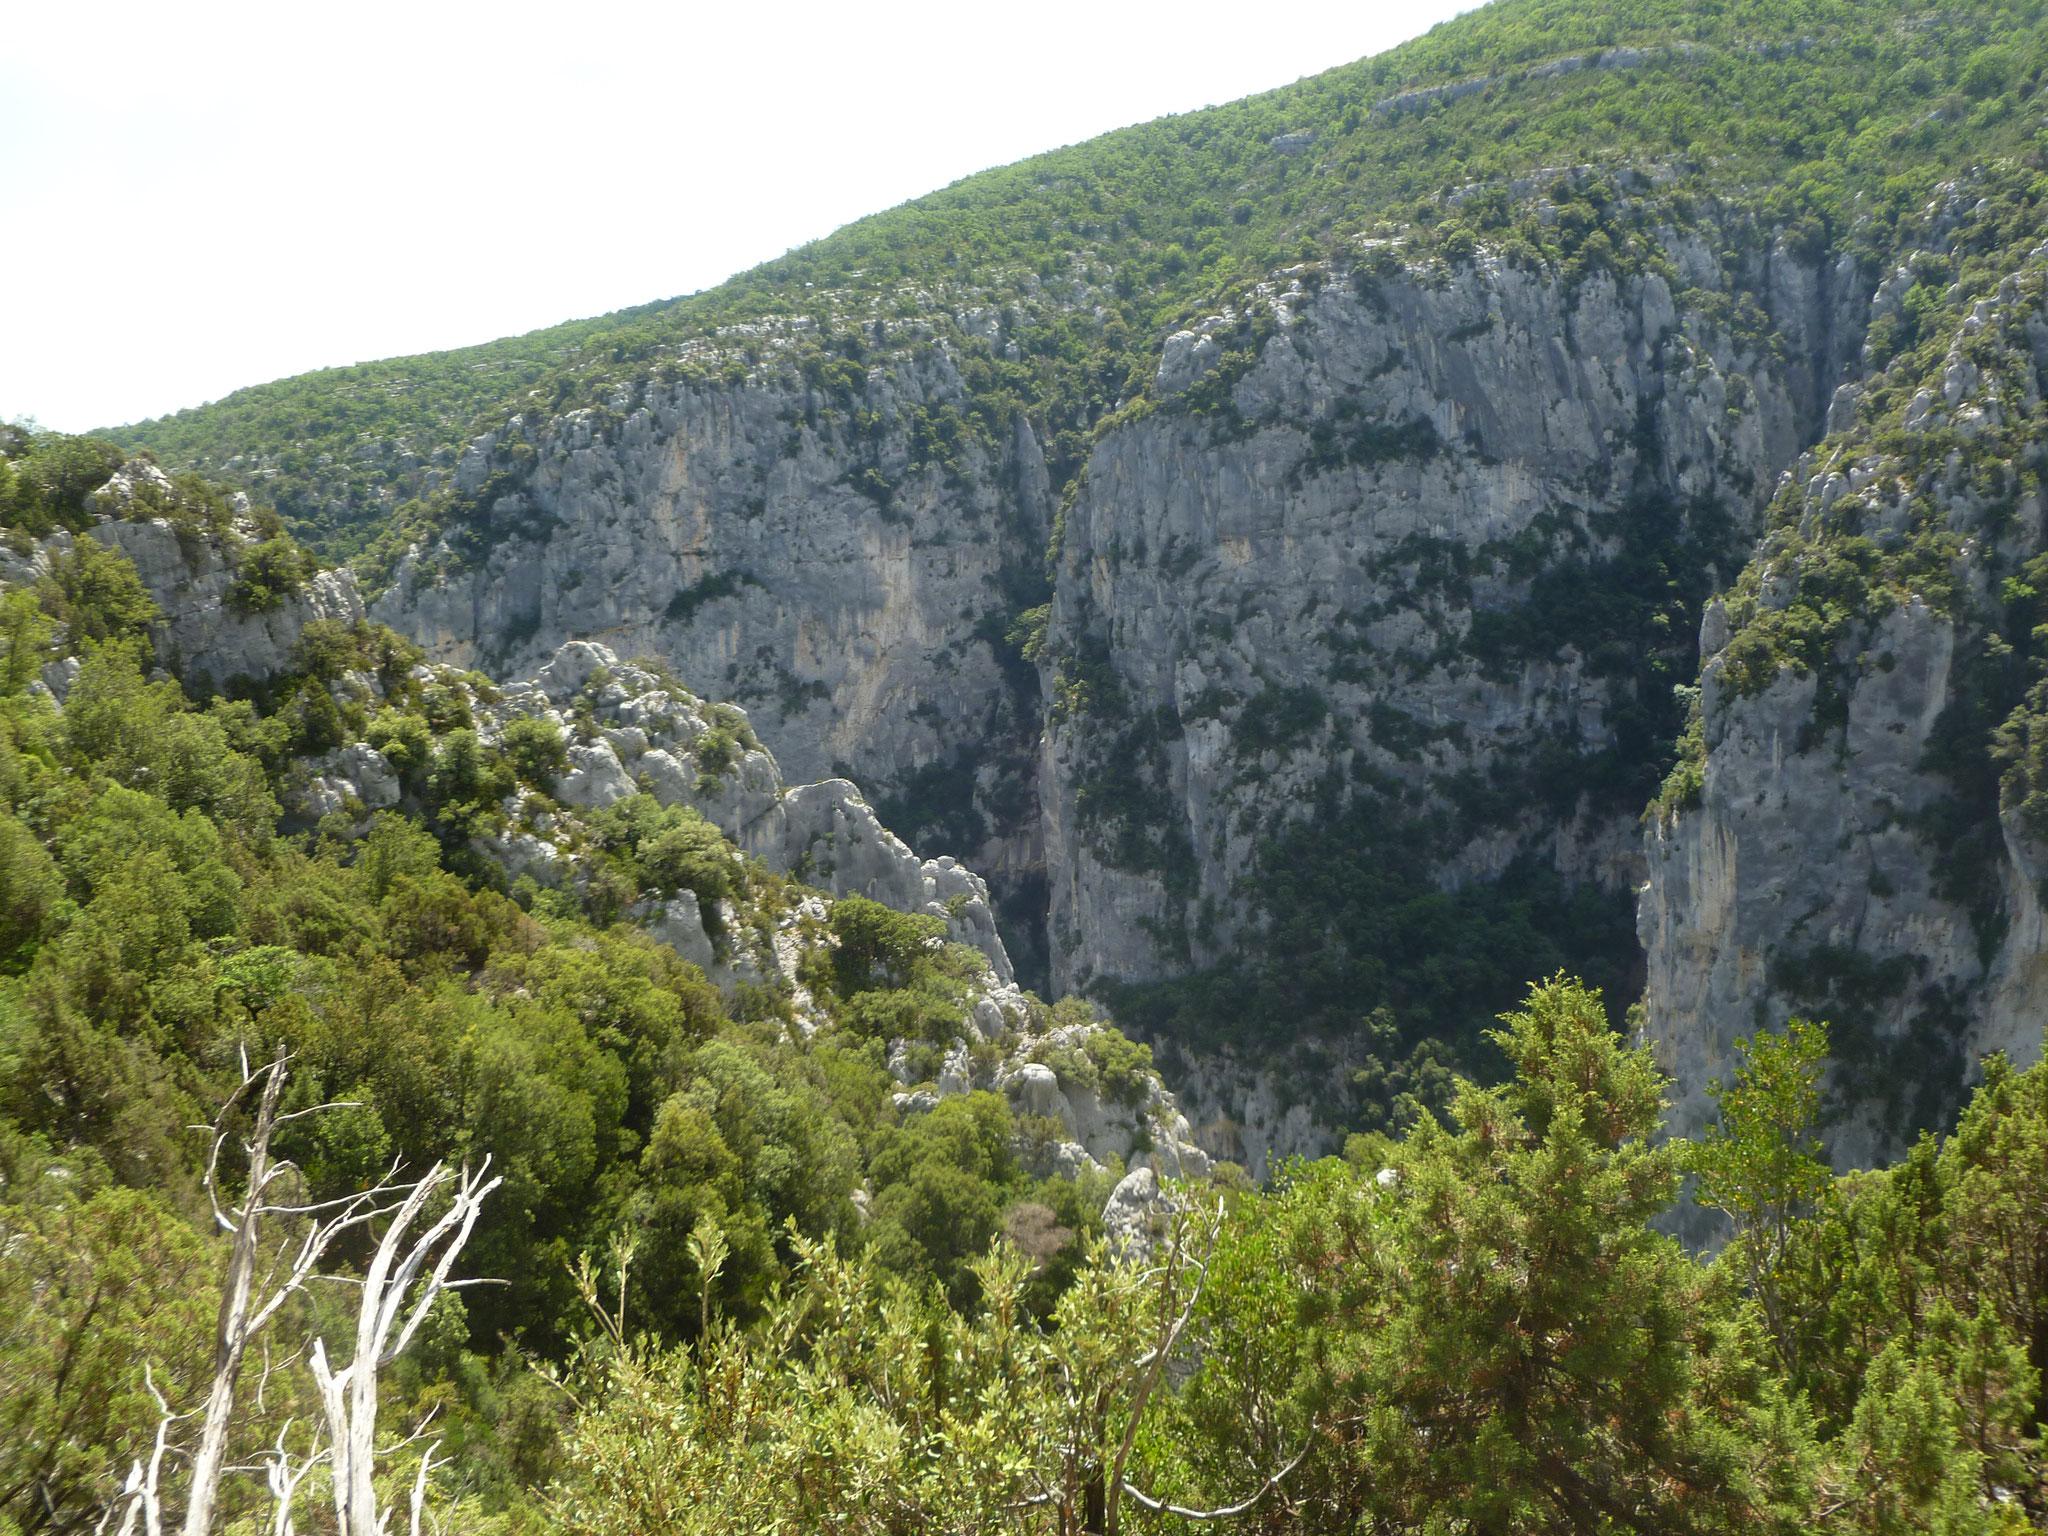 Wandern: Heiss und trocken am Sentiere des Pecheurs